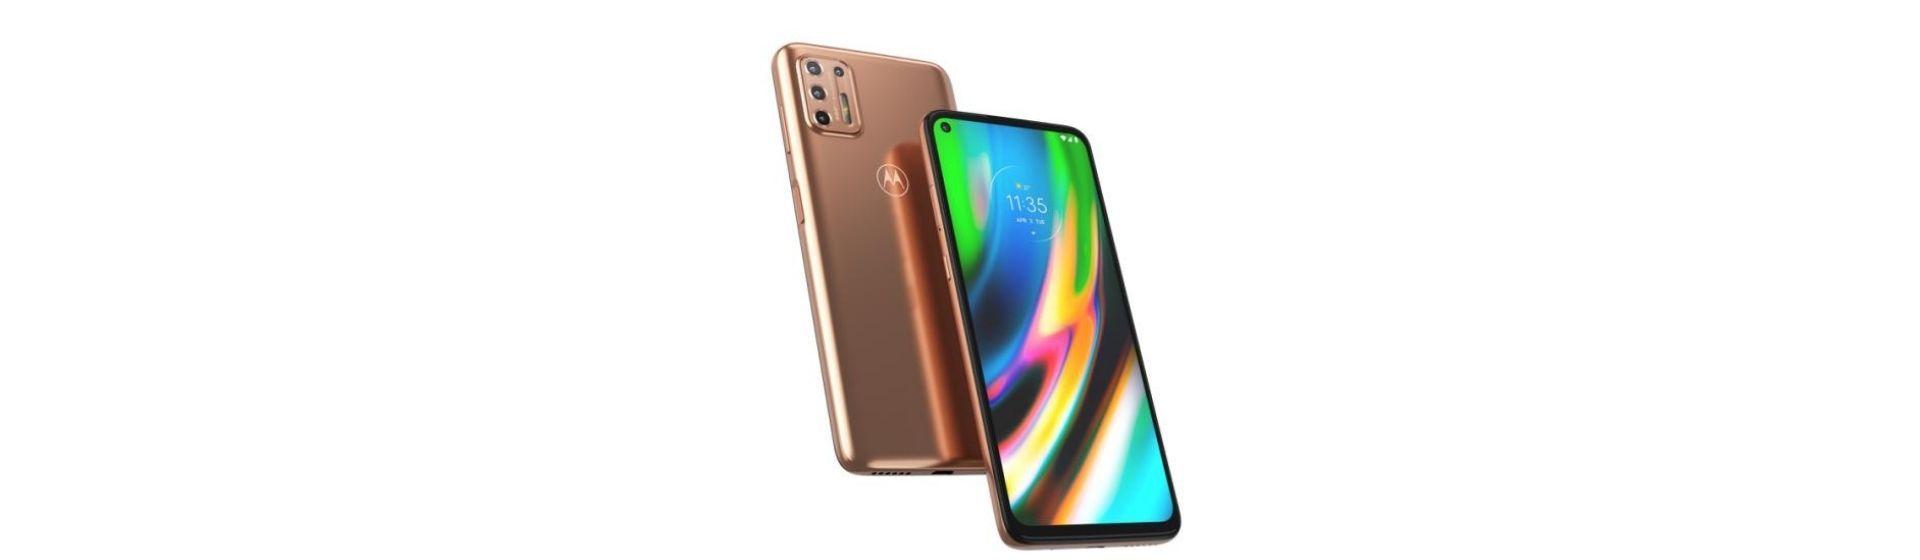 Moto G9 Plus: confira a análise técnica desse celular Motorola